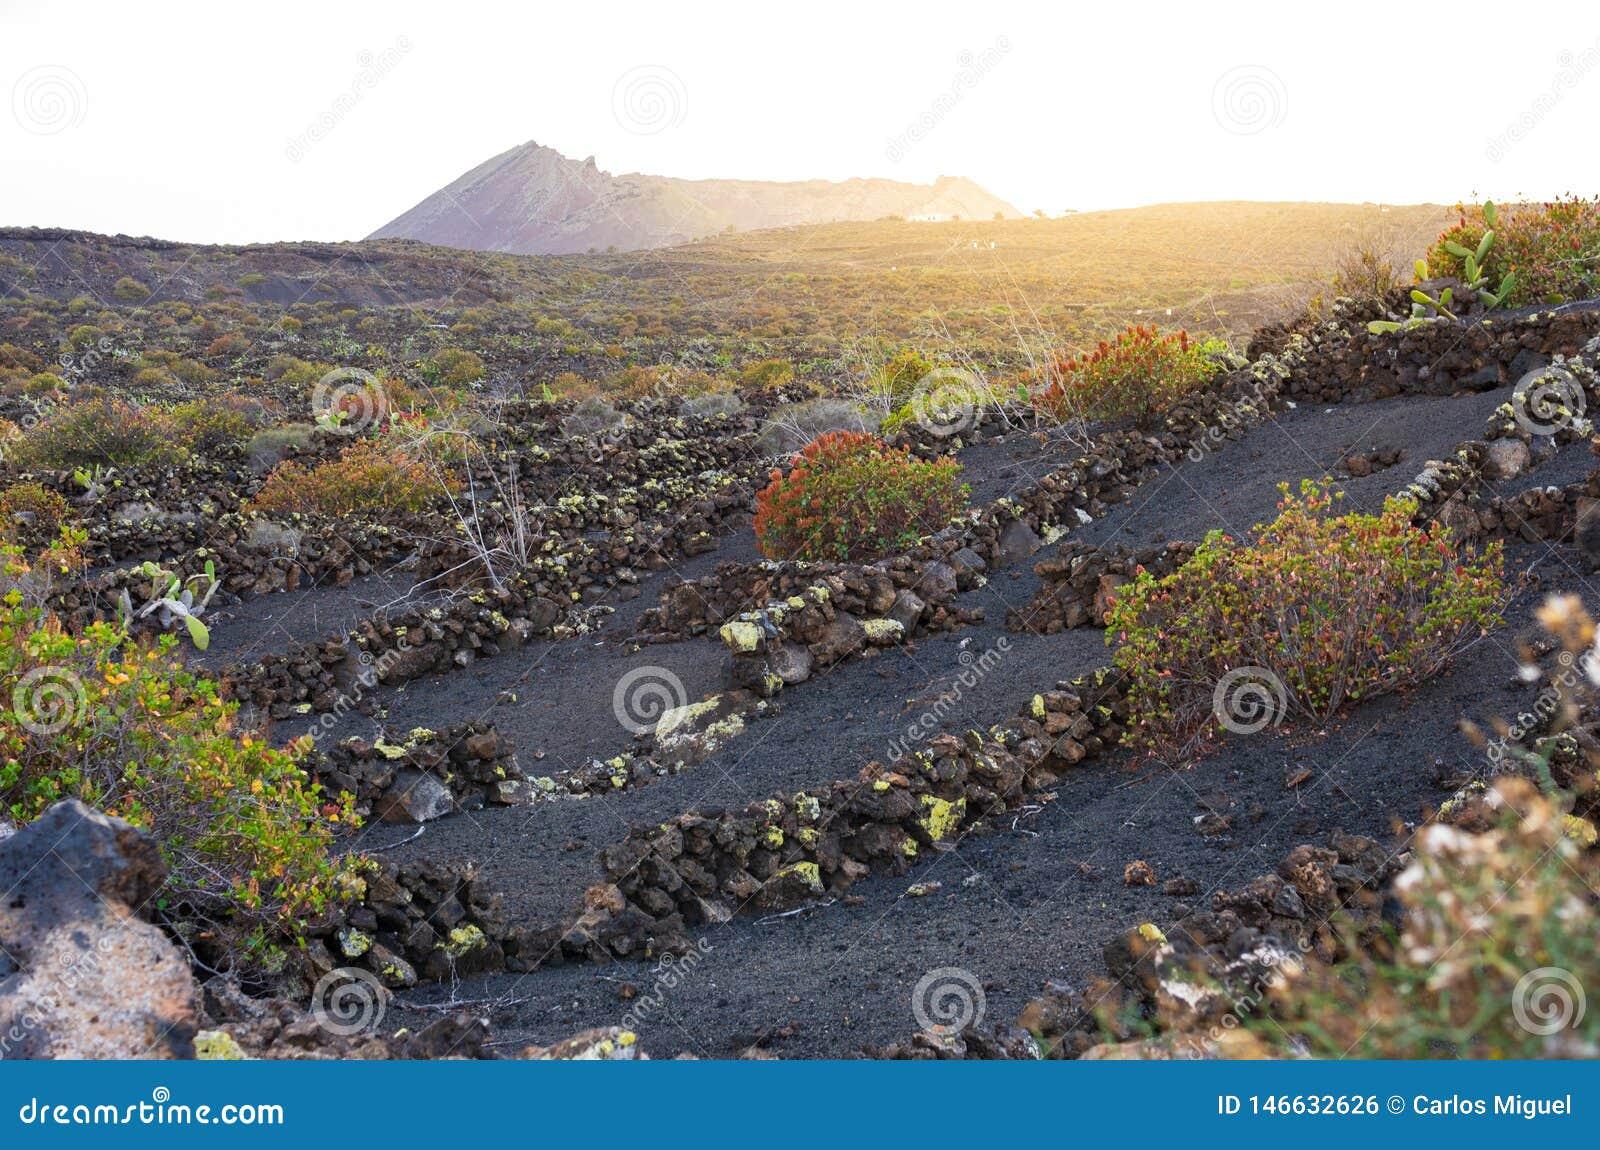 Vineyards on volcanic land in Lanzarote